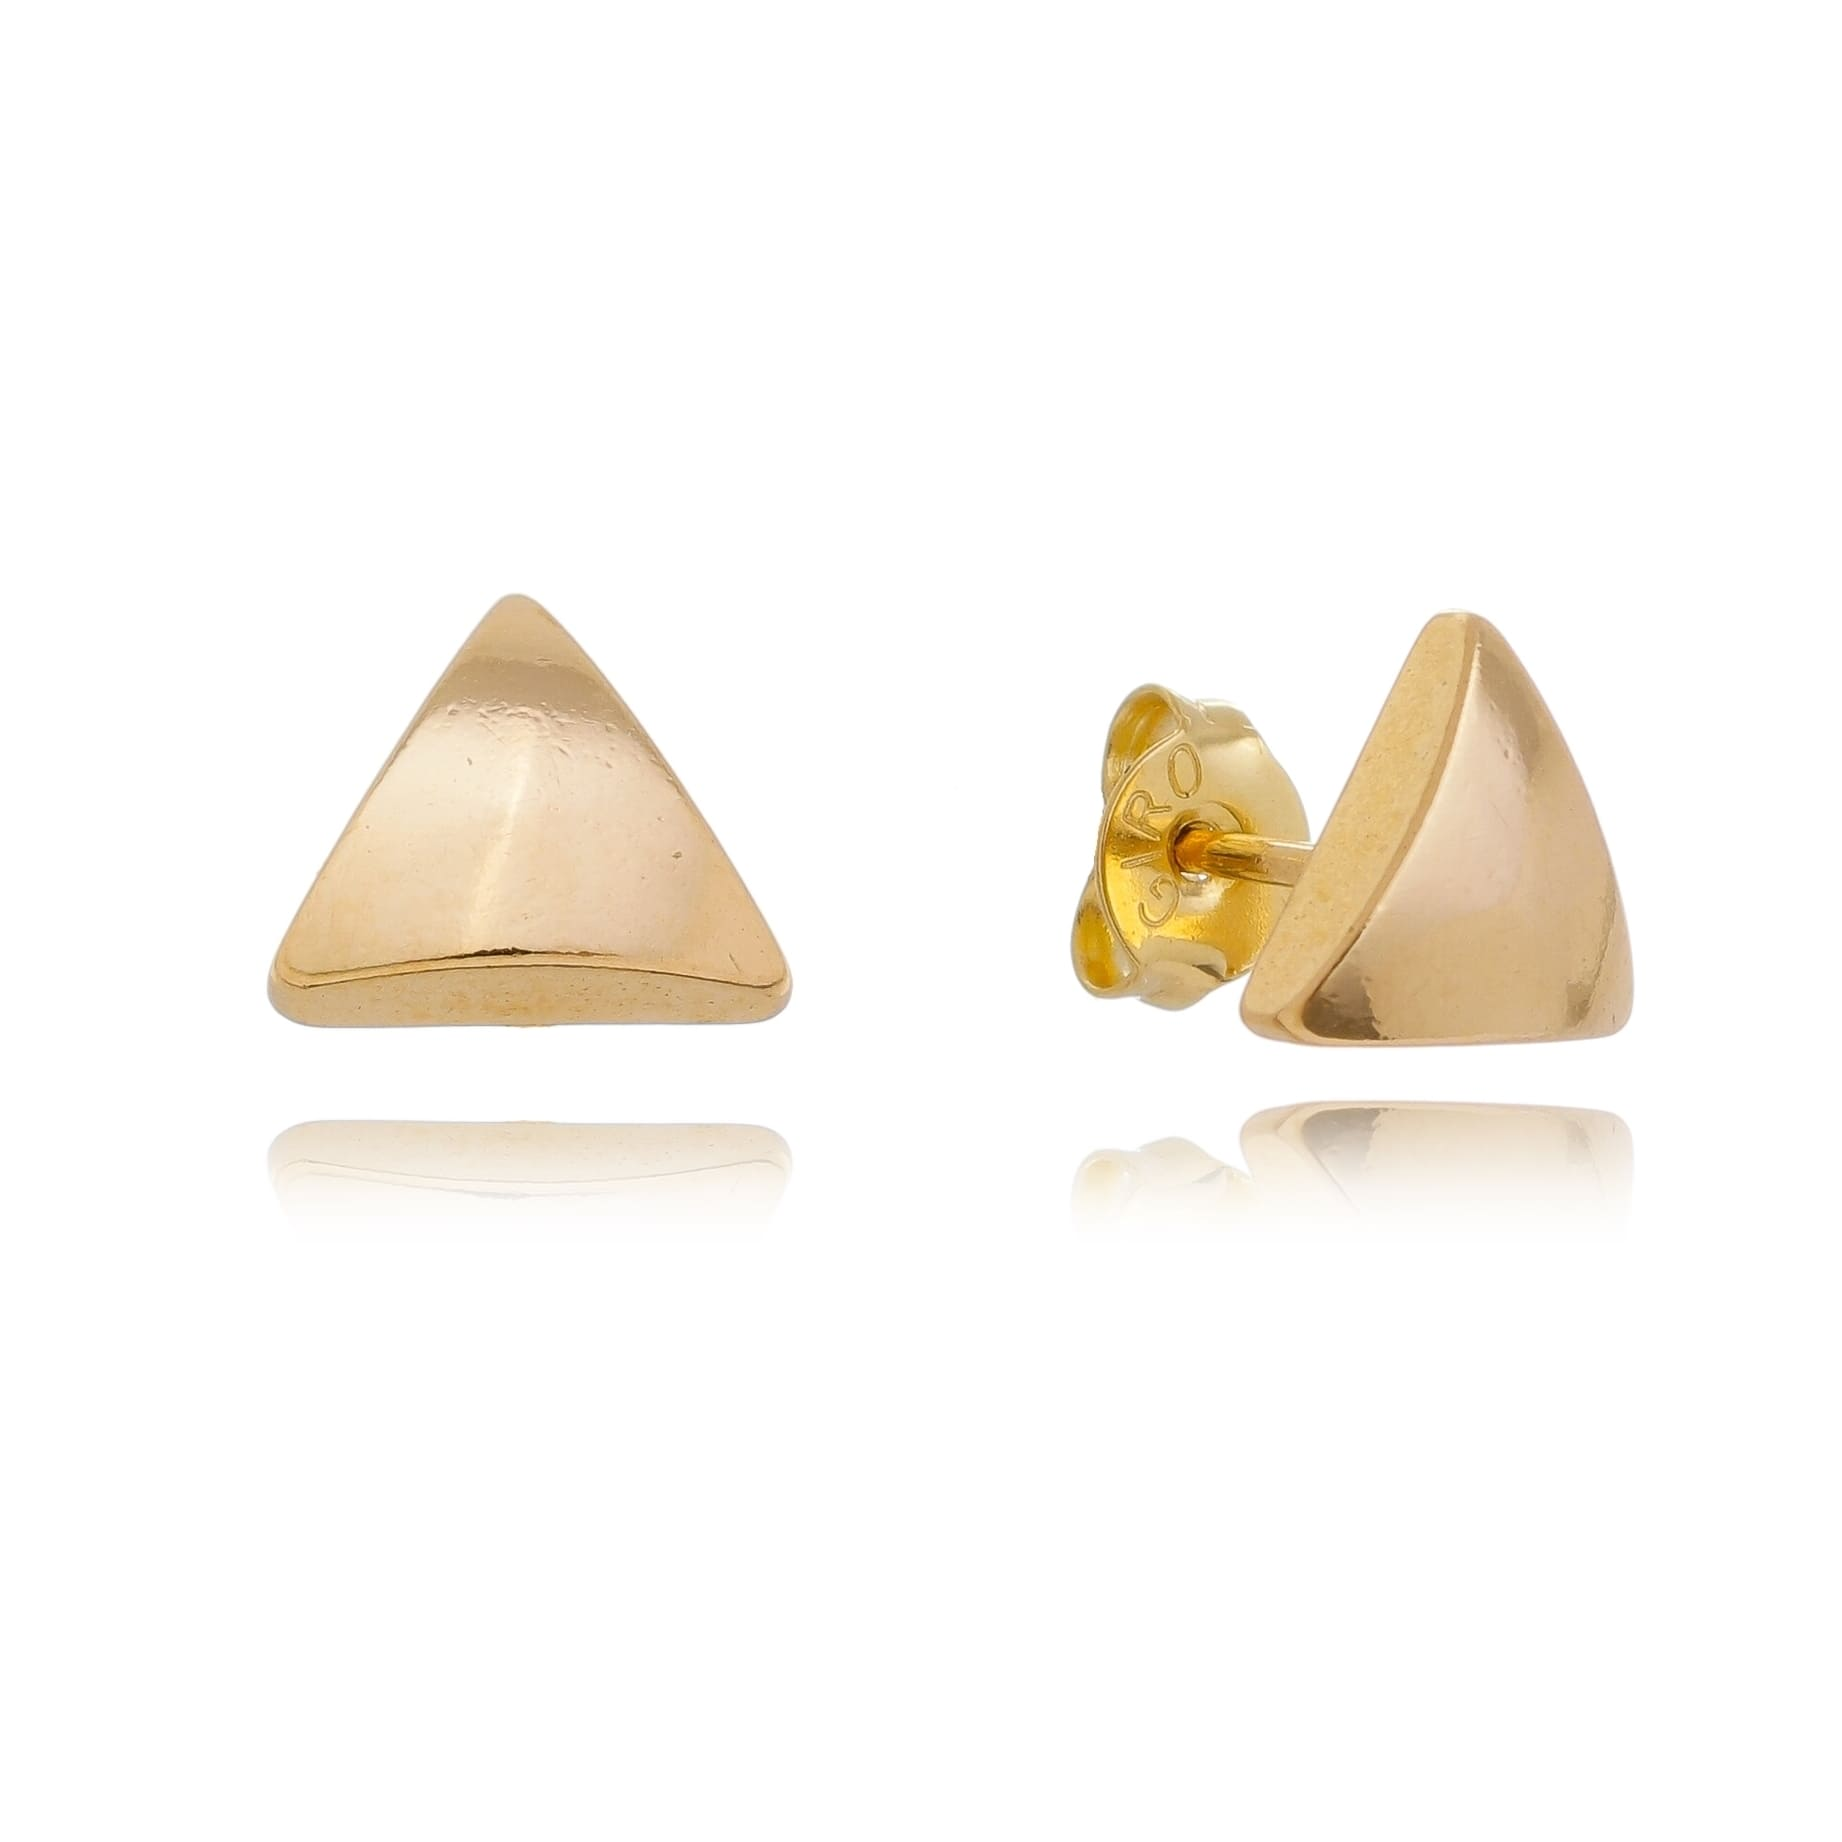 Brinco Triângulo Liso Folheado em Ouro 18k - Giro Semijoias